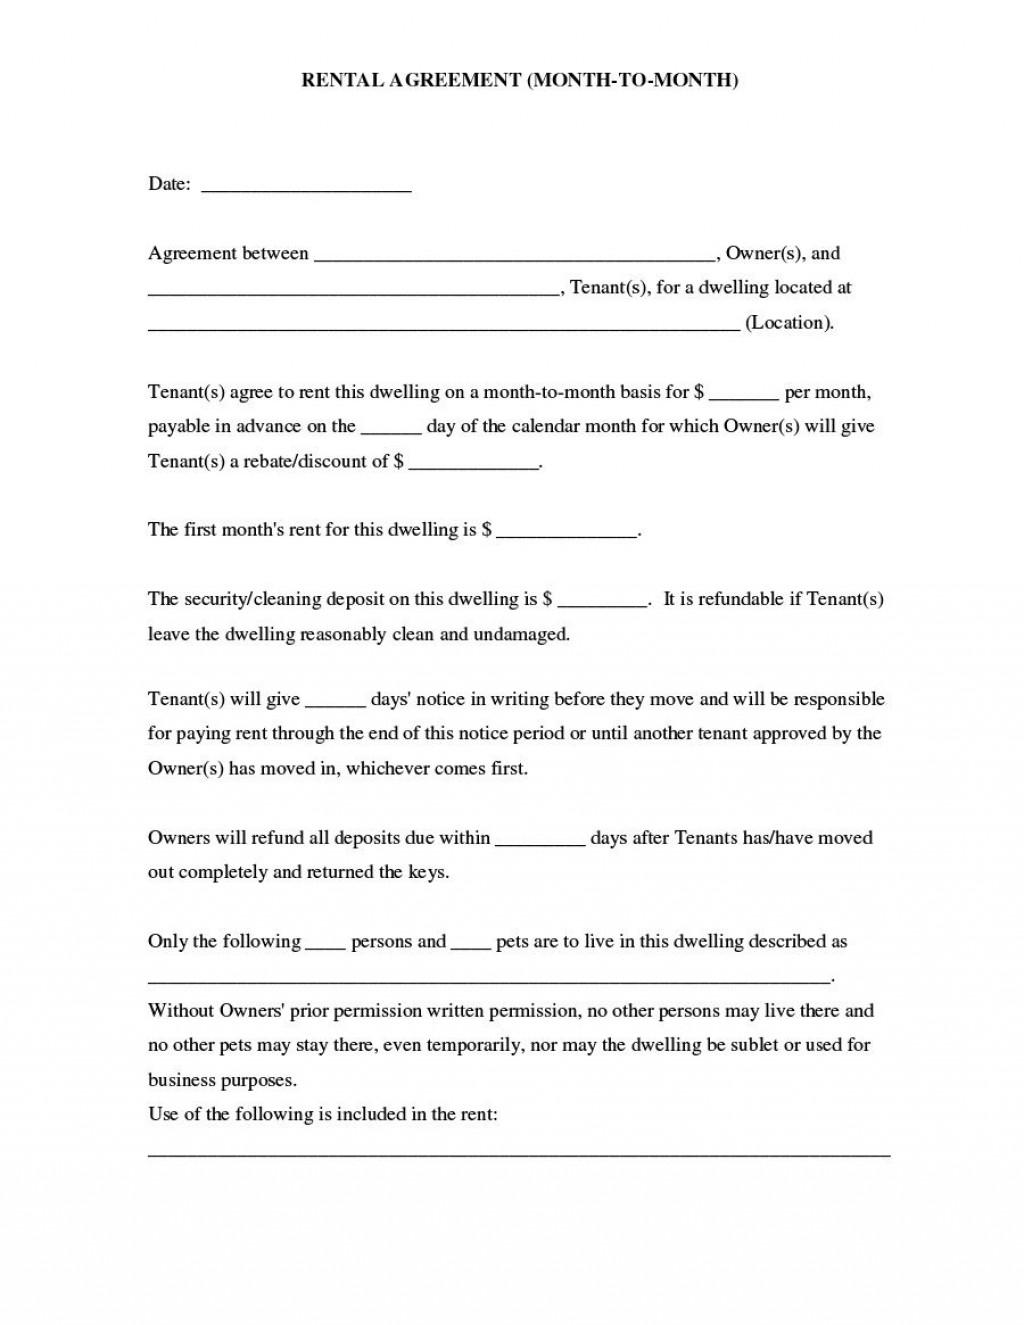 008 Impressive Rental Agreement Template Word Free Inspiration  Tenancy ShortholdLarge